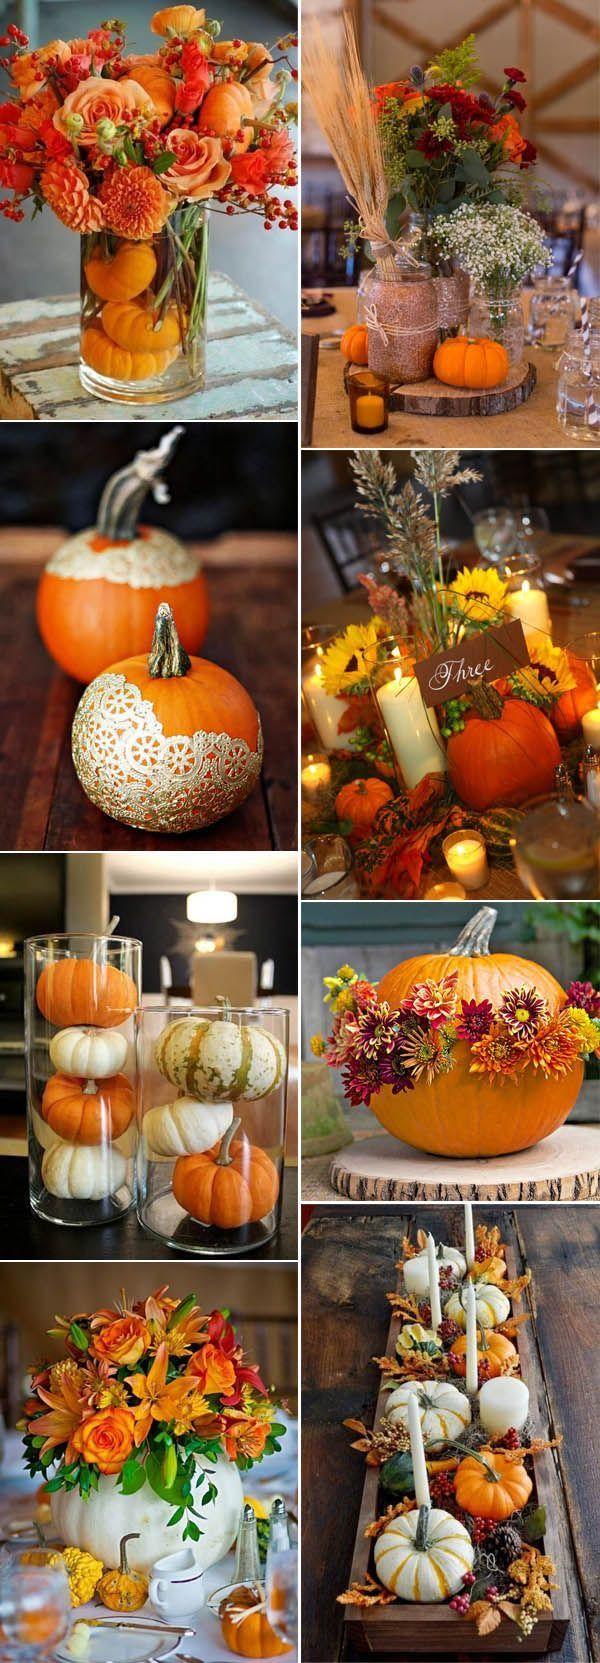 Diy fall wedding decor  Fun with Pumpkins  DIY  Pinterest  Fall wedding centerpieces